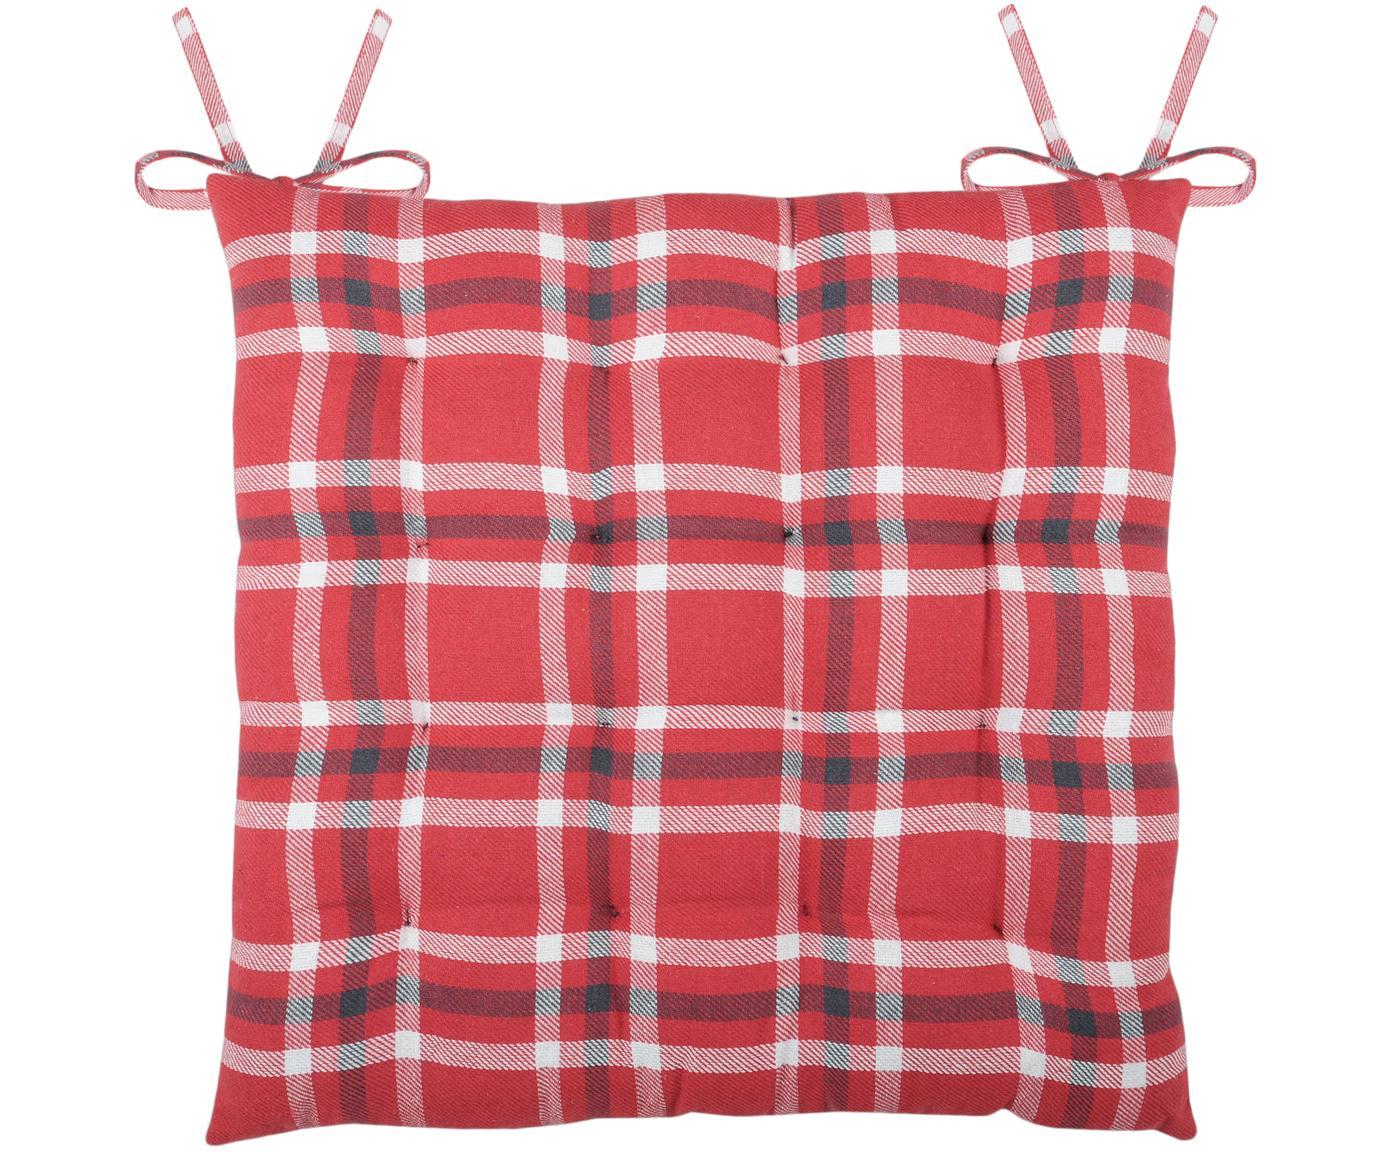 Cuscino sedia Teddybear, Rivestimento: cotone, Rosso, nero, bianco, Larg. 40 x Lung. 40 cm